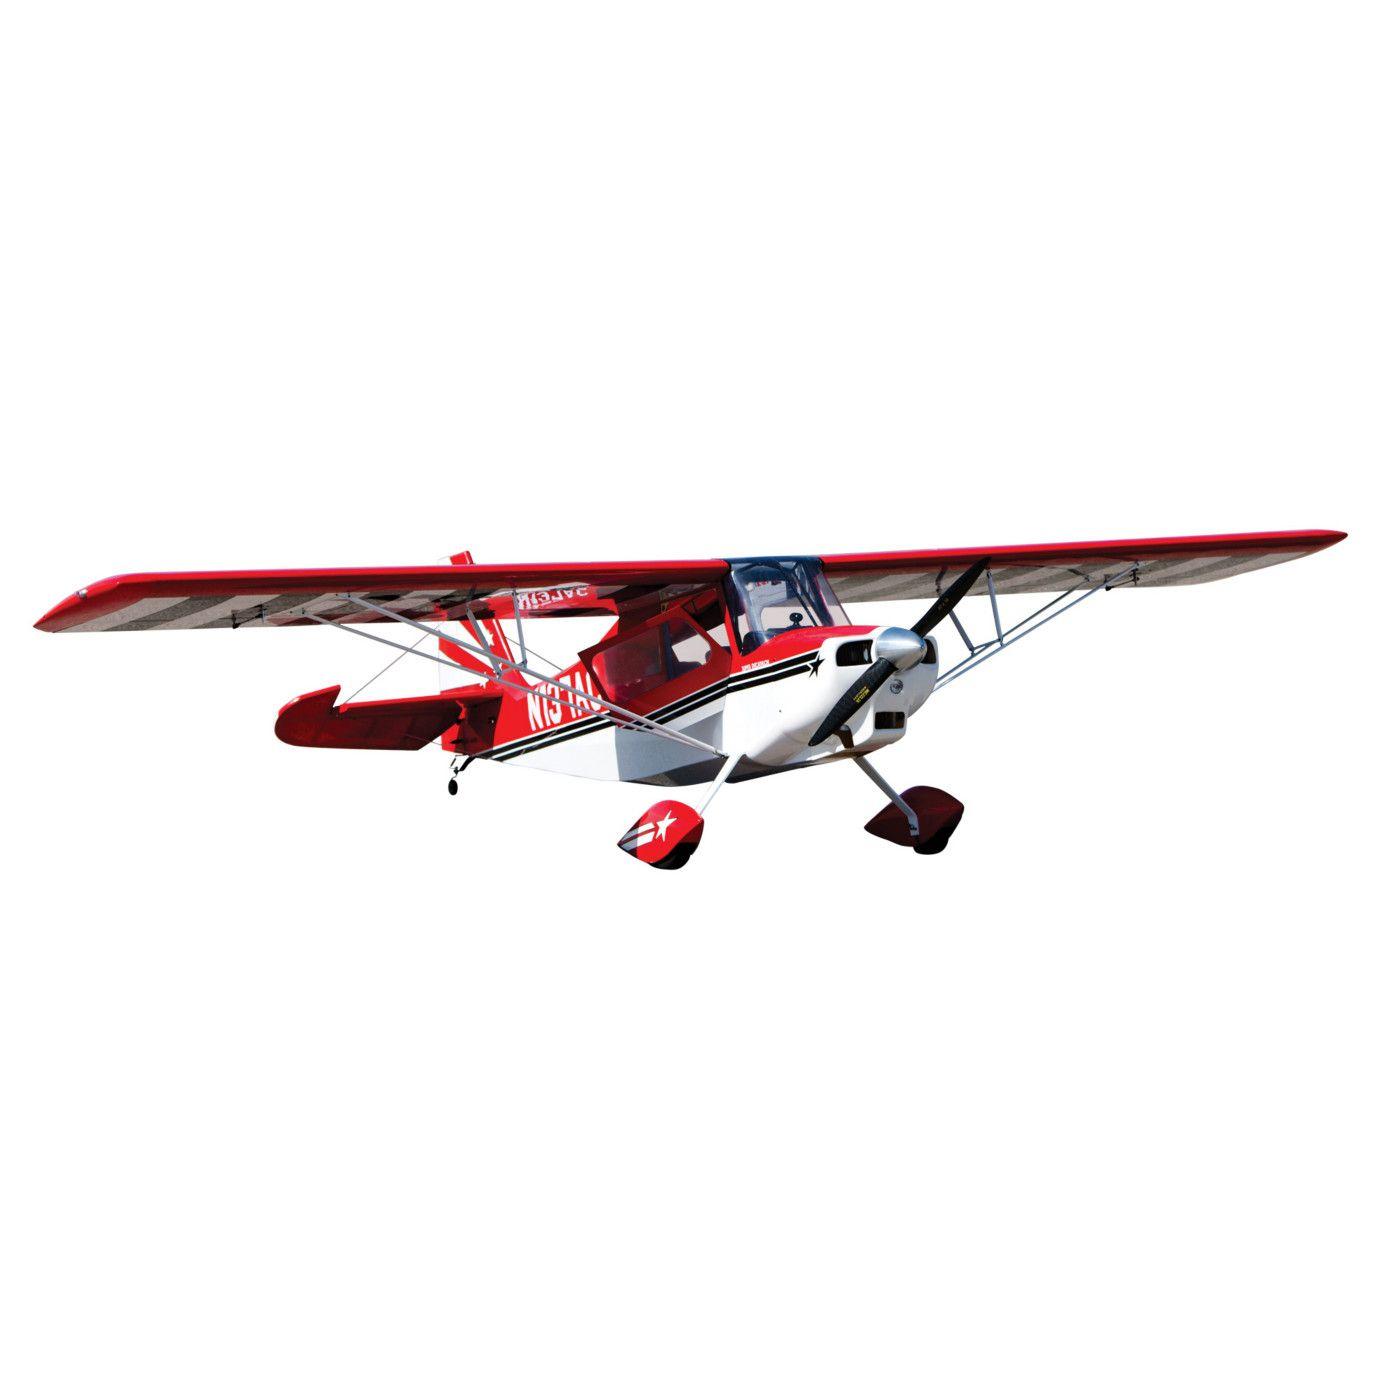 Hangar-9 Super Decathlon 100cc Mike McConville Almost